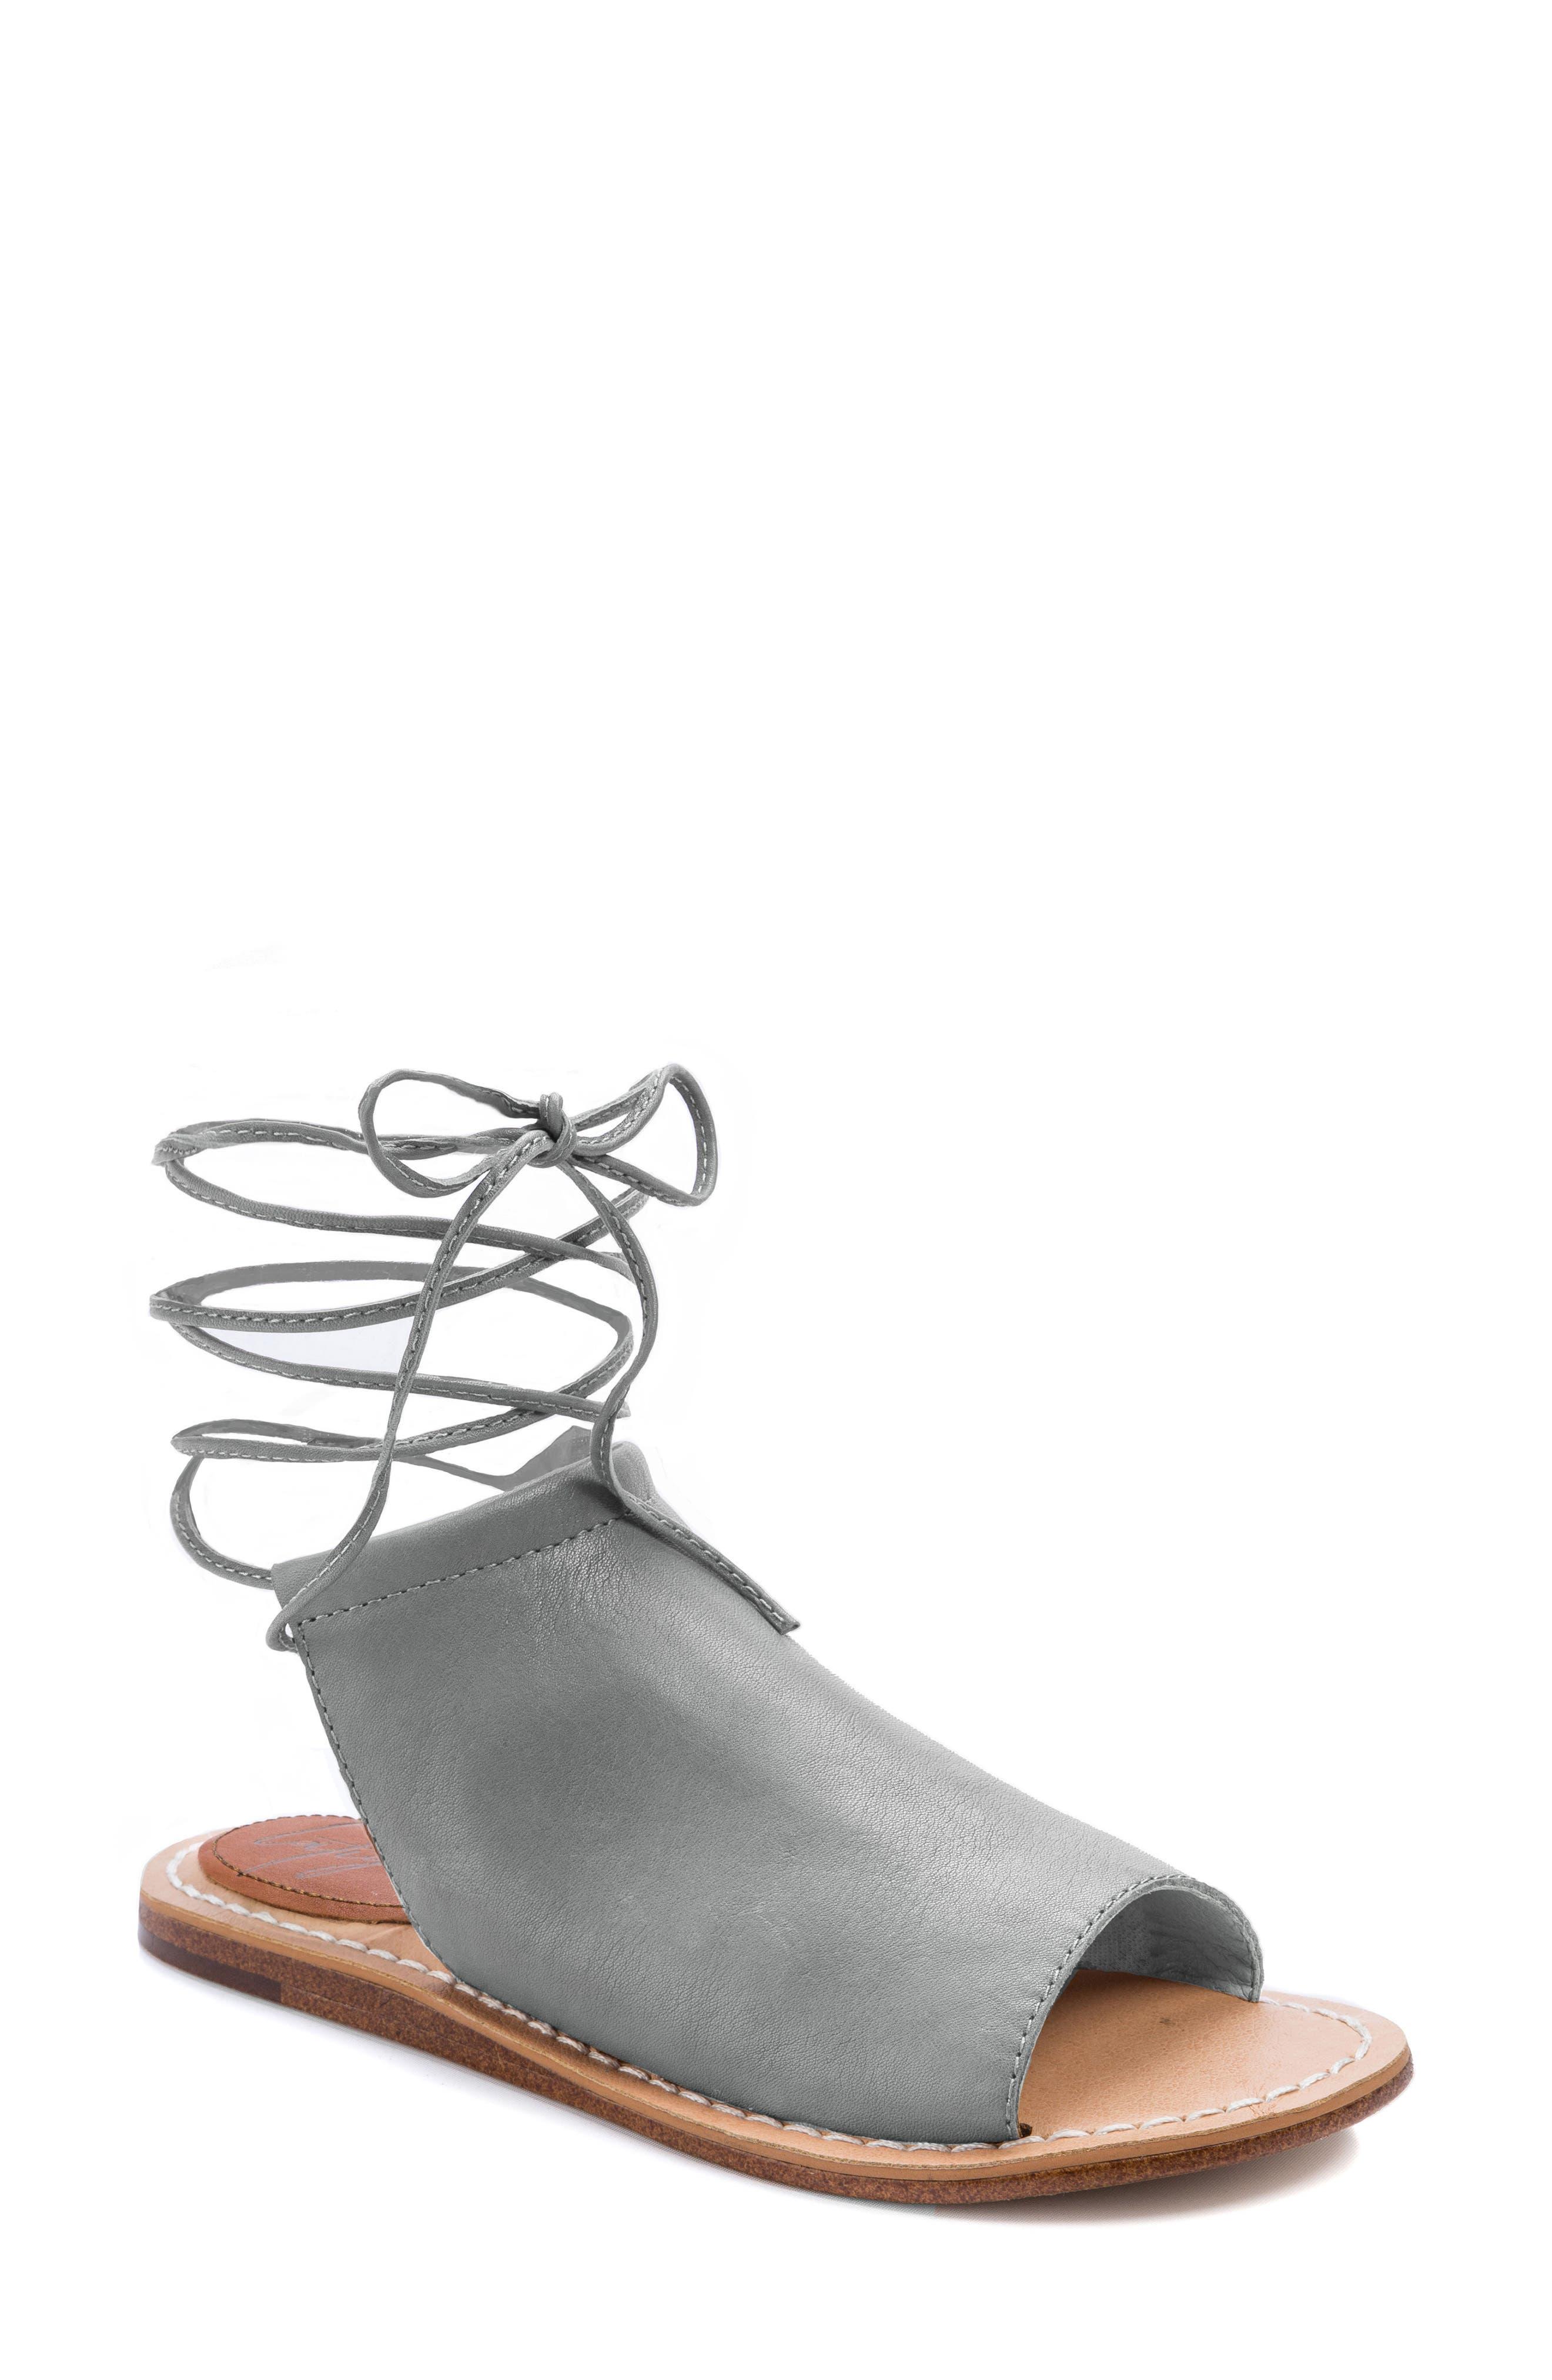 Vin Sandal,                         Main,                         color, Mist Grey